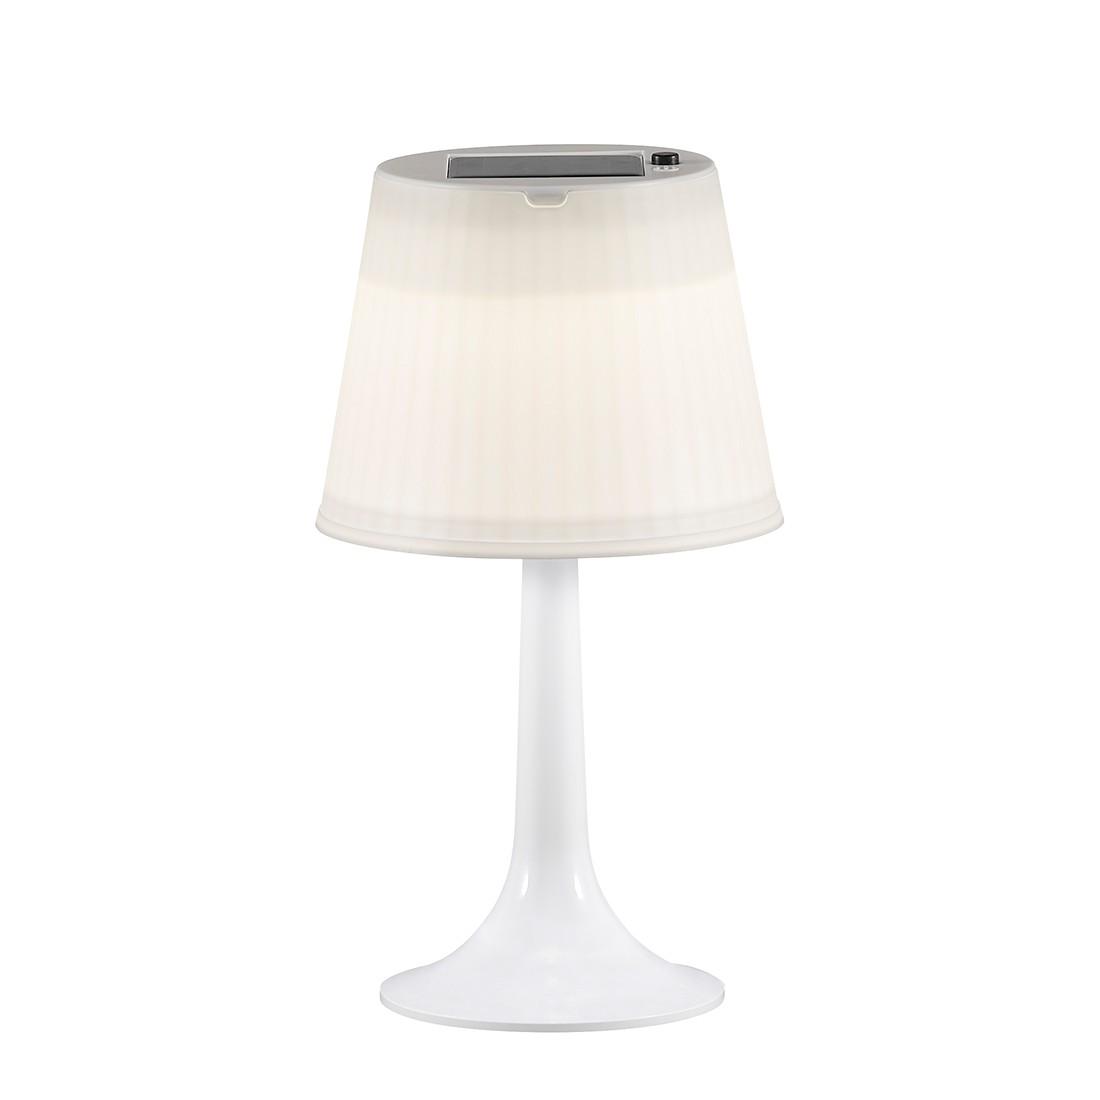 LED-Außenleuchte Assisi Sitra ● Kunststoff ● 1-flammig ● Weiß- Konstsmide A+